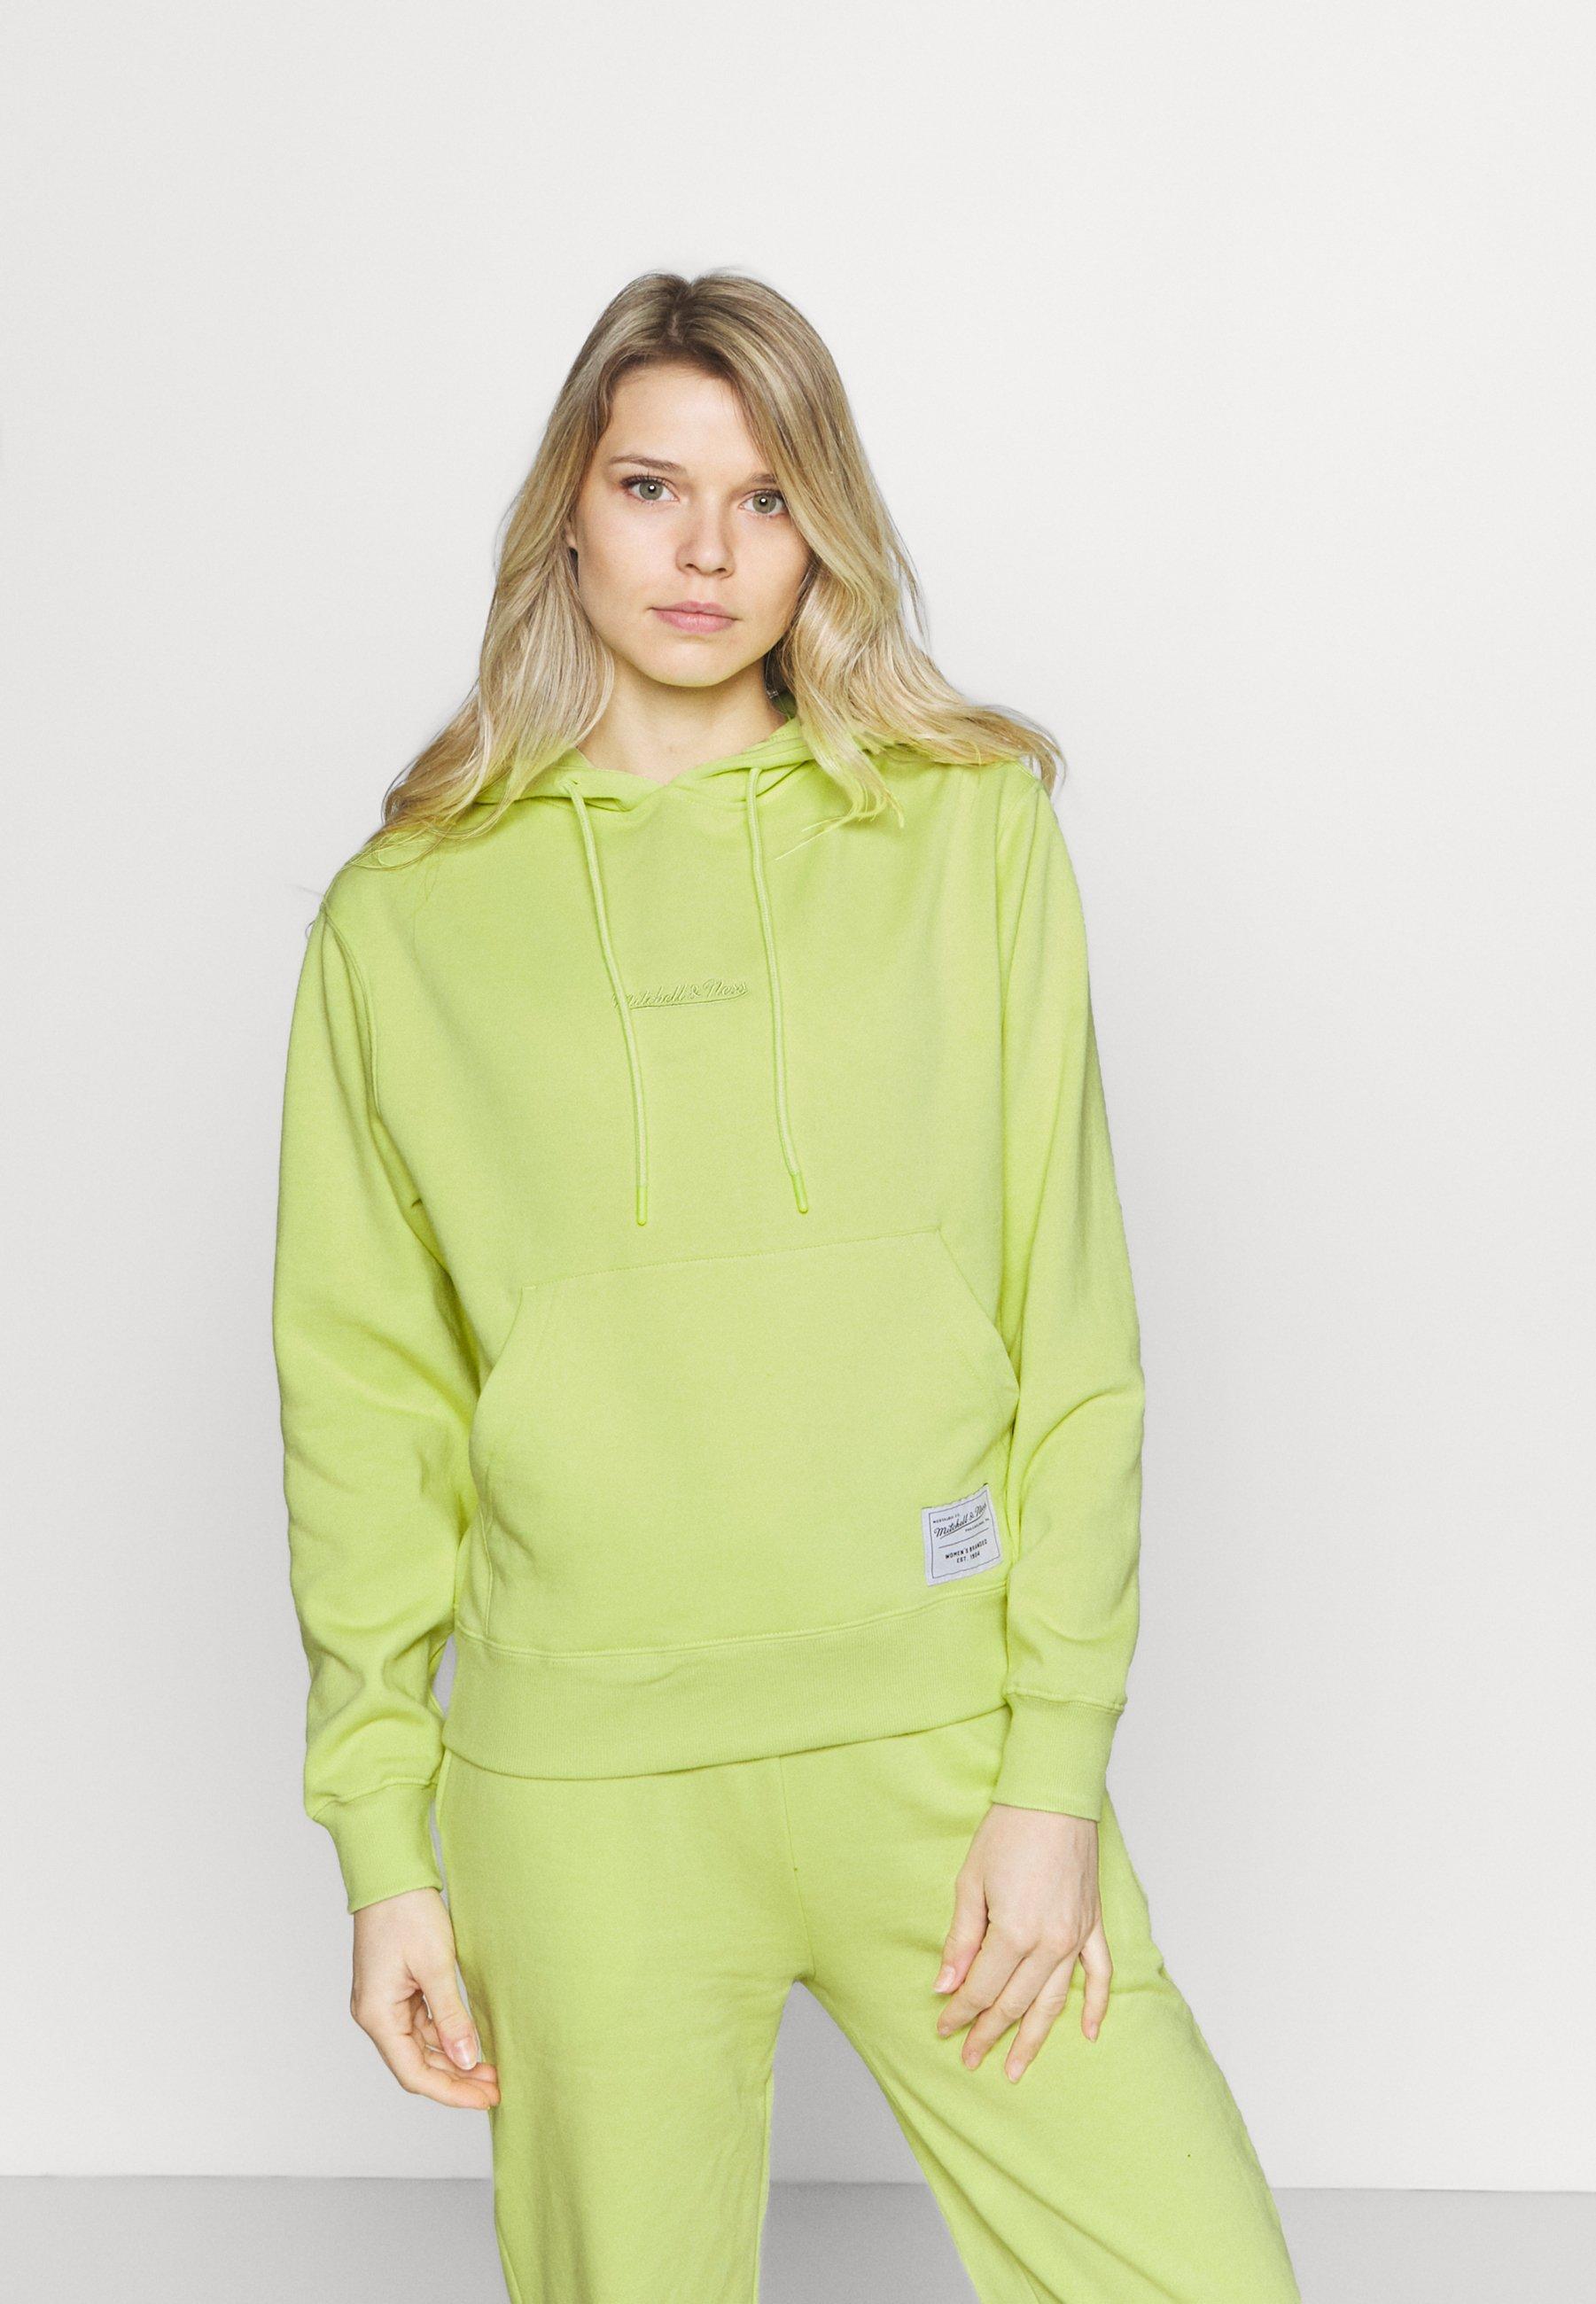 Women BRANDED WOMENS ESSENTIALS HOODIE - Sweatshirt